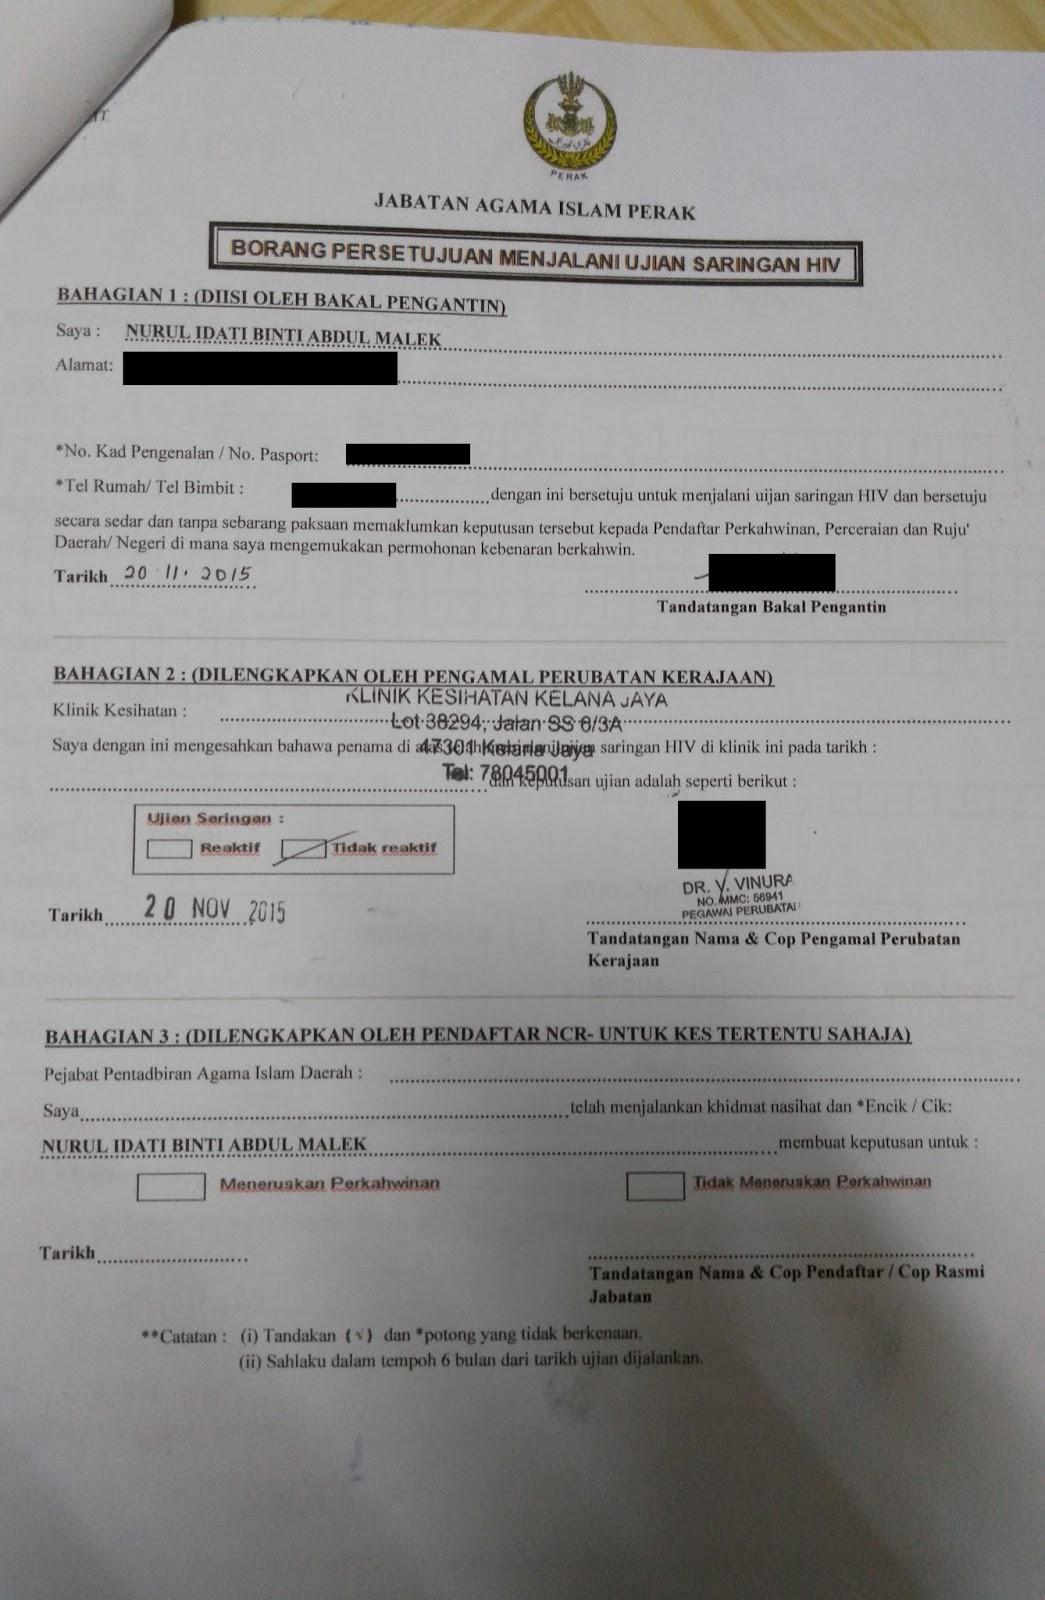 Cara Cara Isi Borang Nikah Online 2015 Perak Johor Hutan Kabut